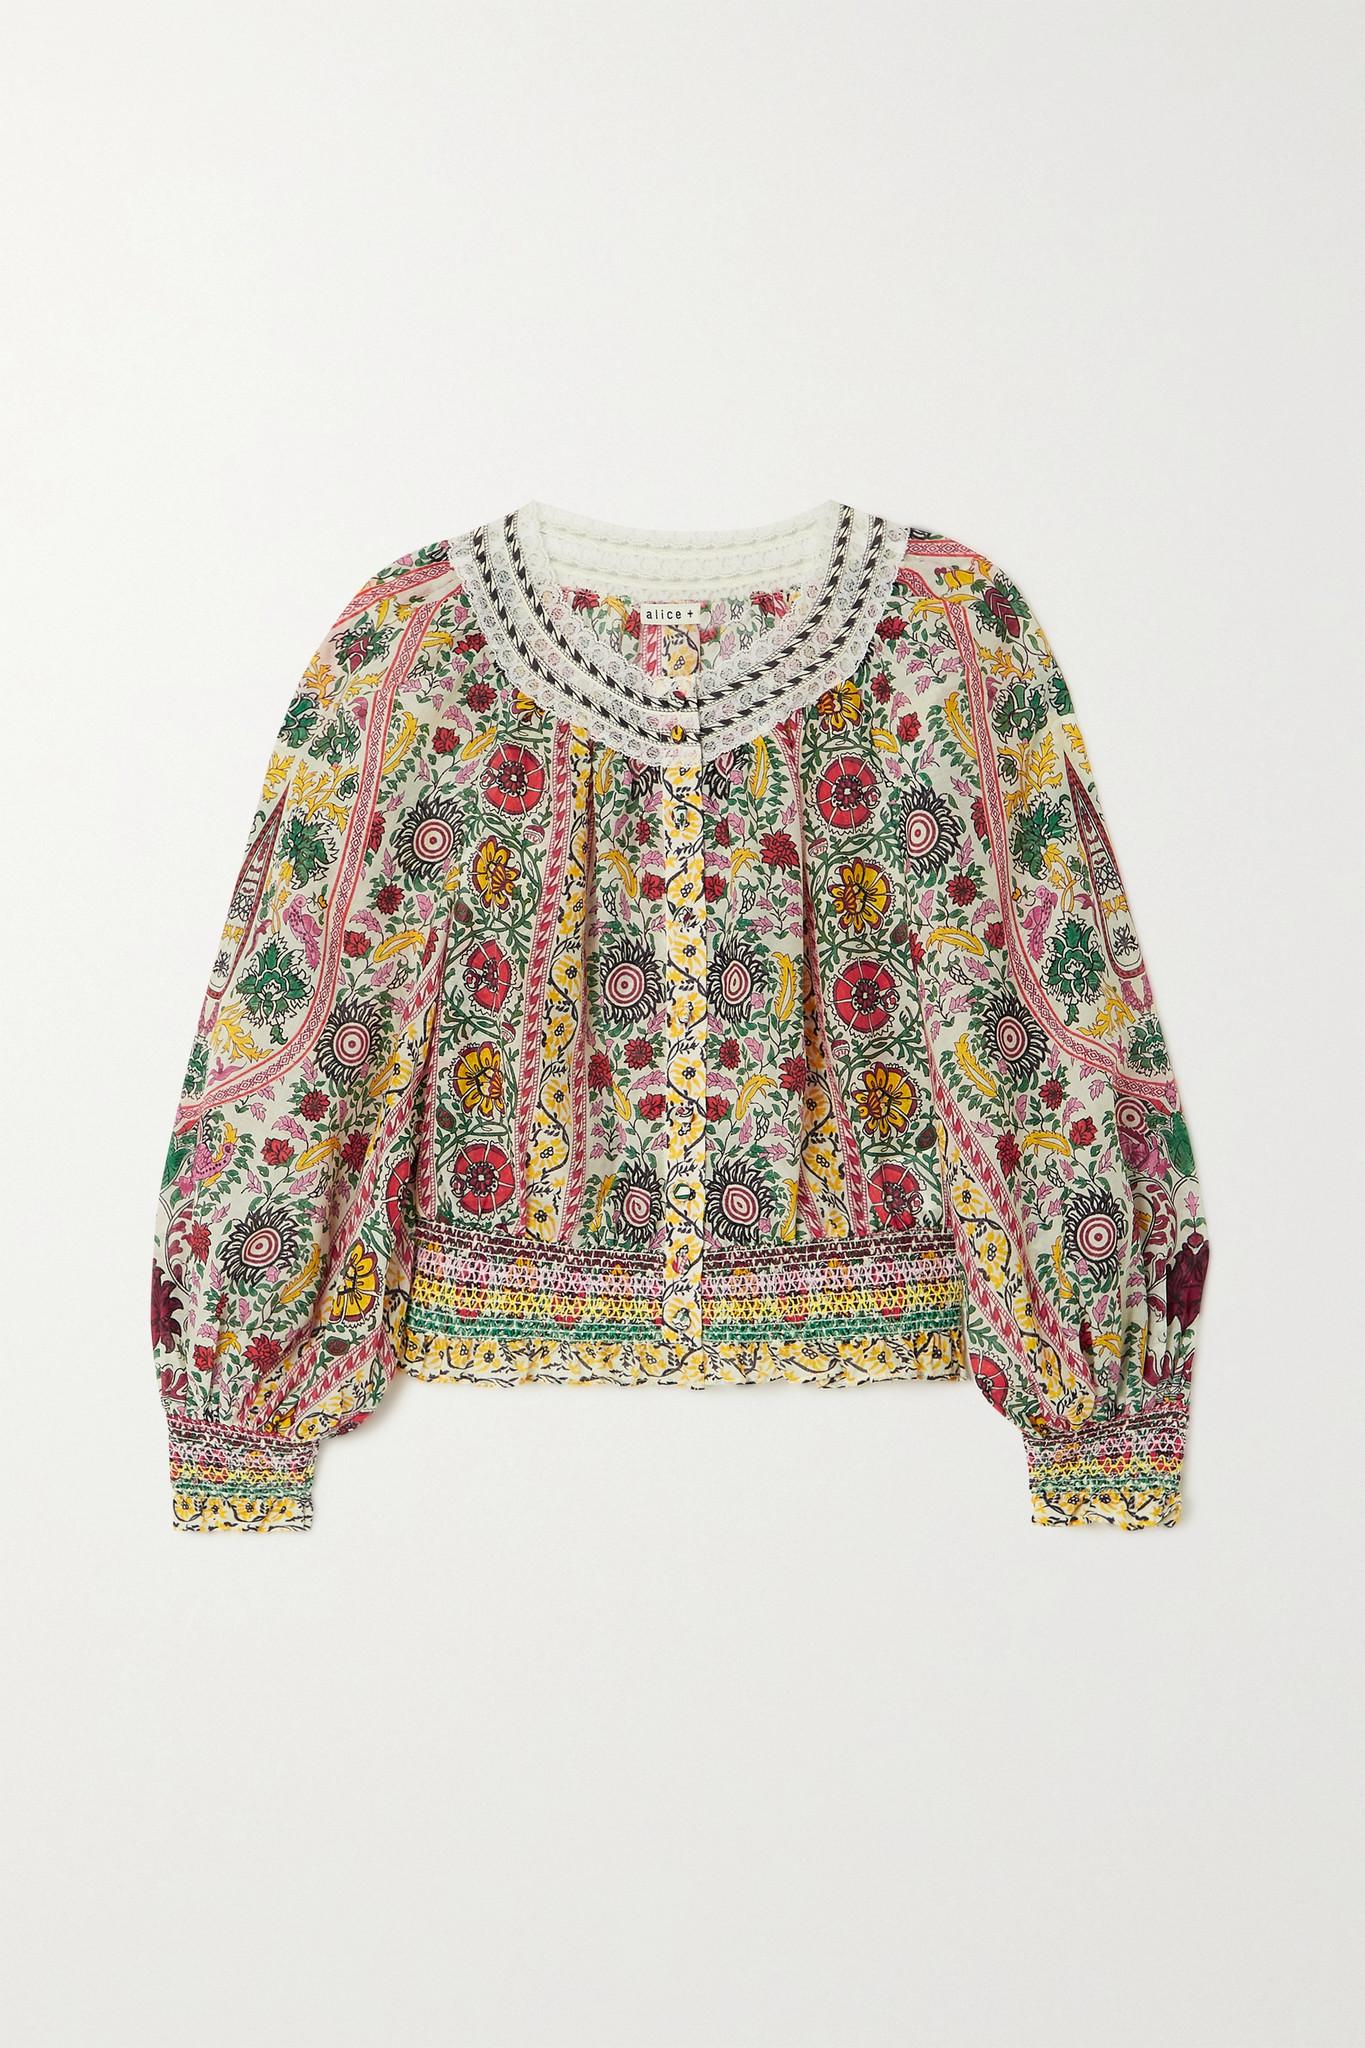 ALICE + OLIVIA - Cherelle 花卉印花棉丝混纺短款女衫 - 米色 - x small